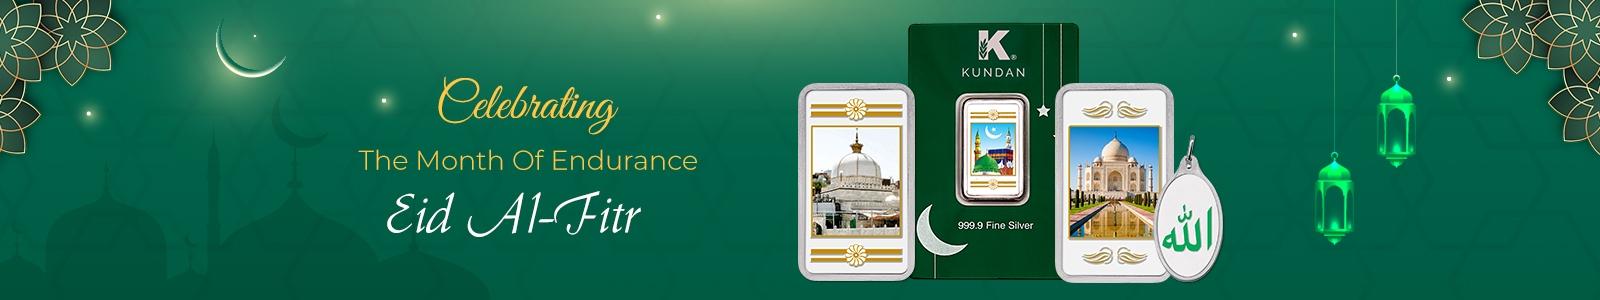 Celebrating The Month Of Endurance – Eid Al-Fitr